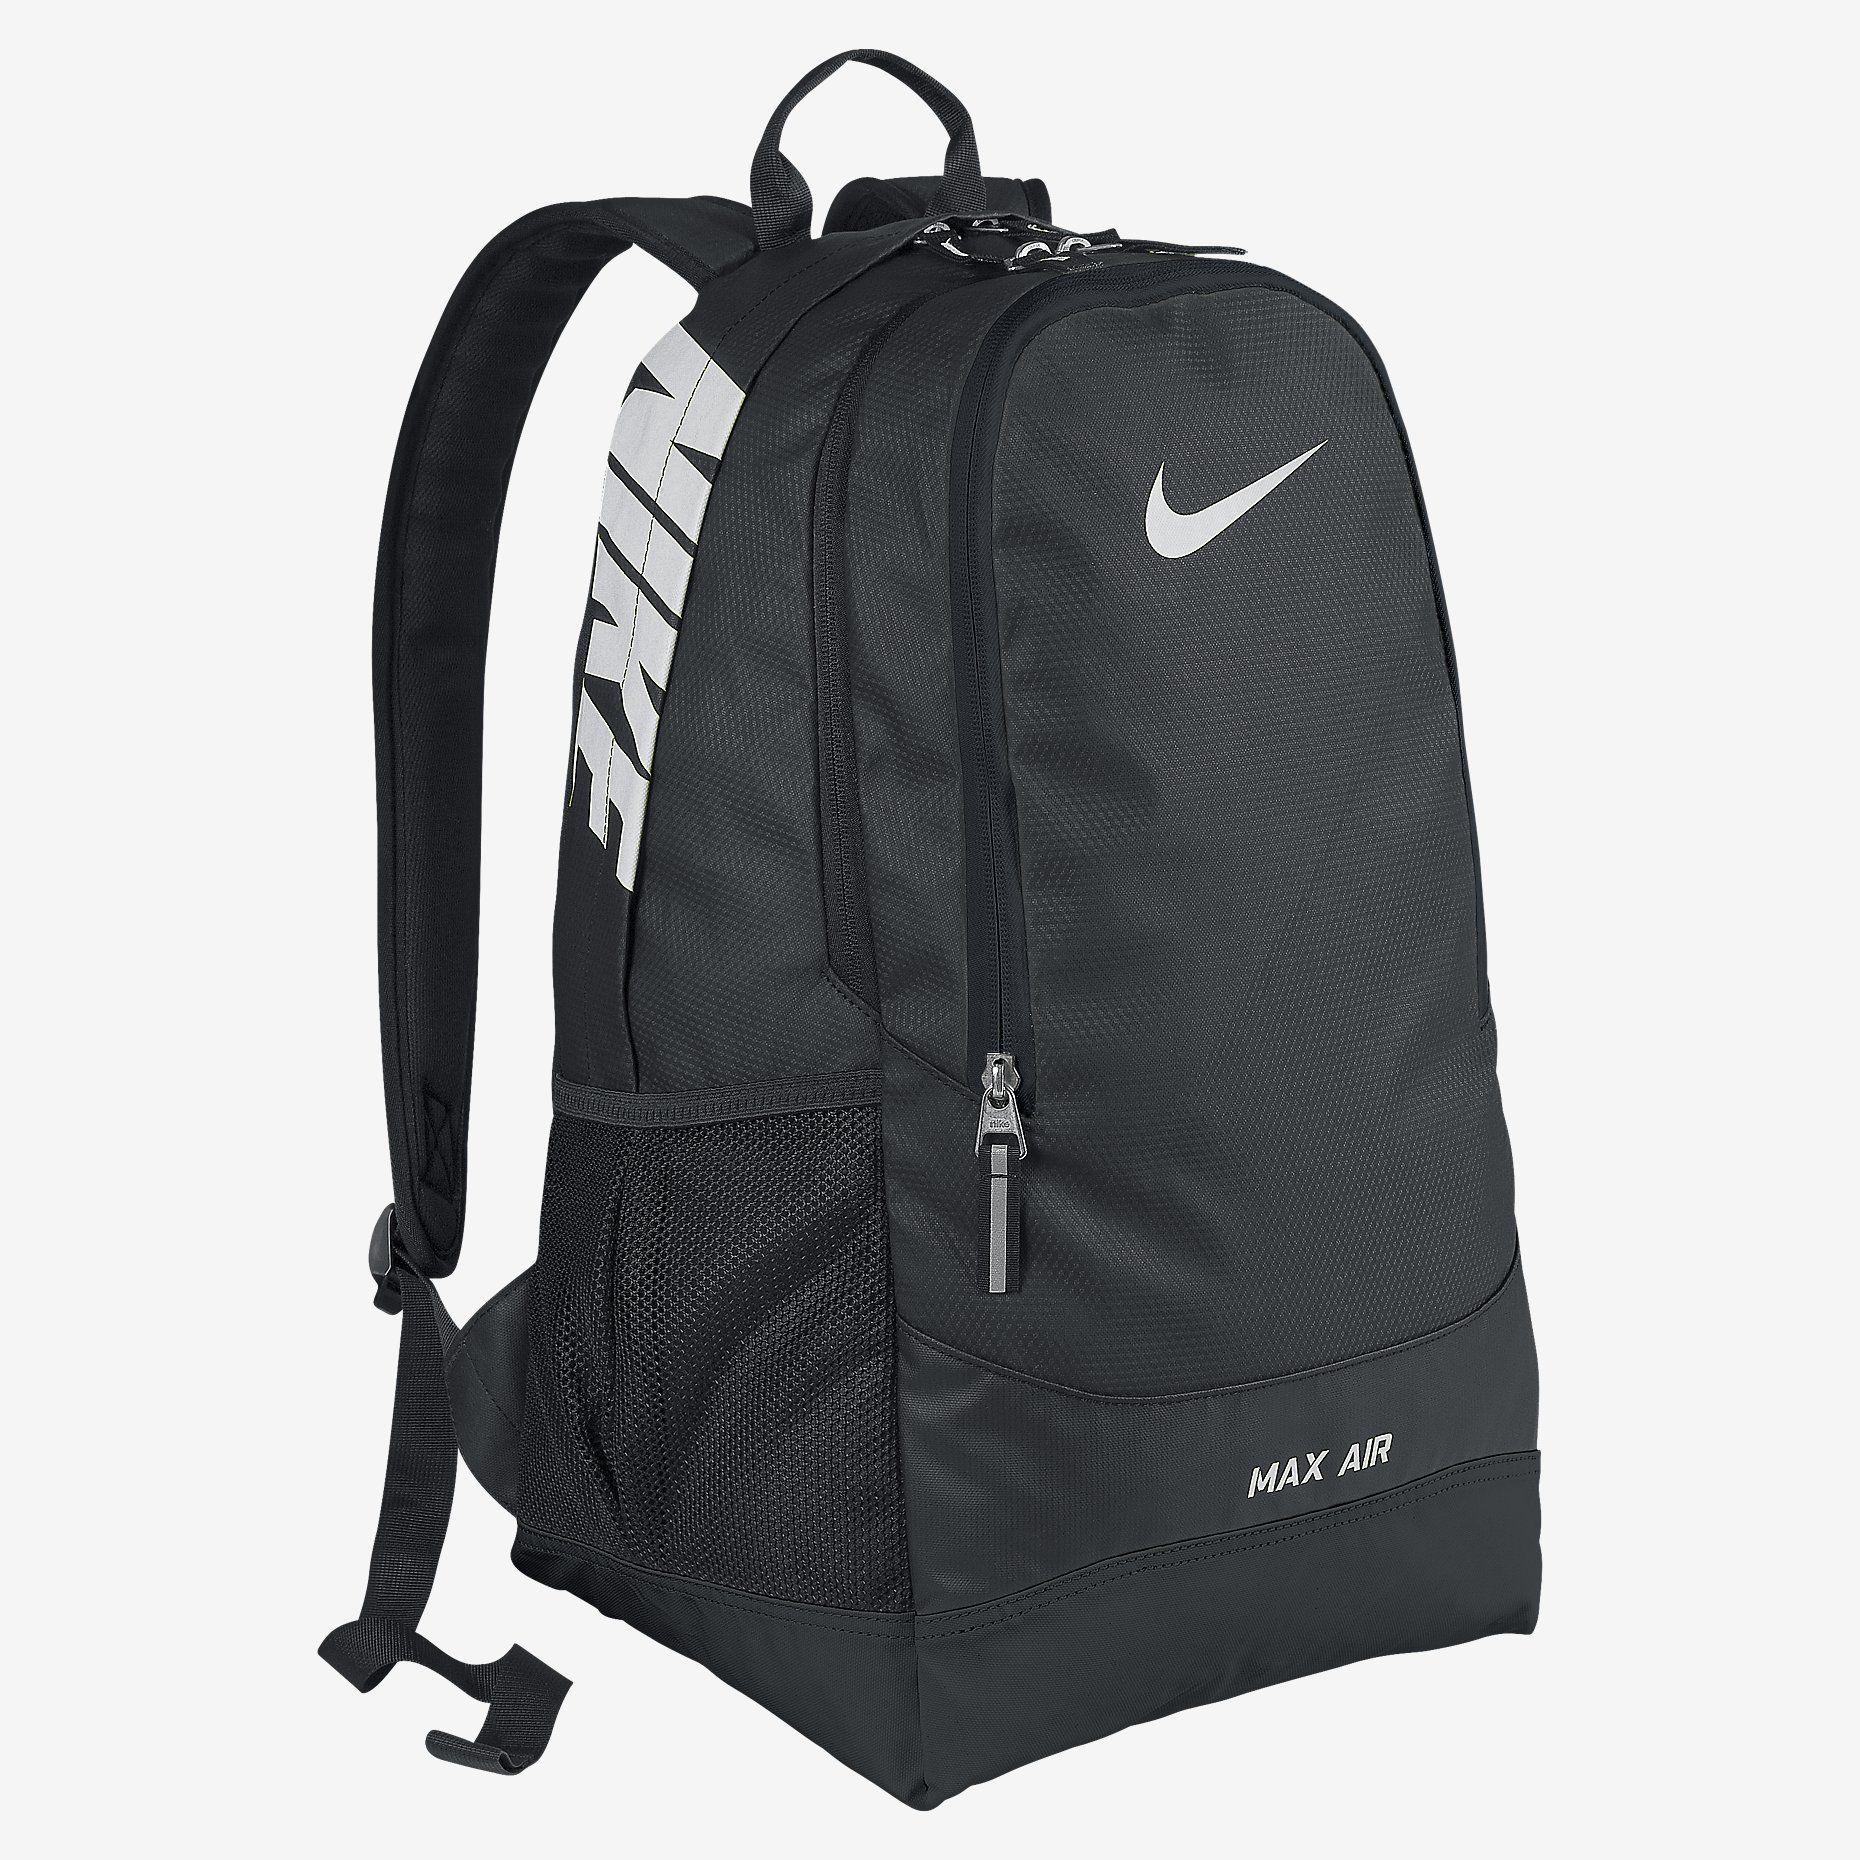 Cheap Nike Backpacks For Girls- Fenix Toulouse Handball 7829925deb9ca